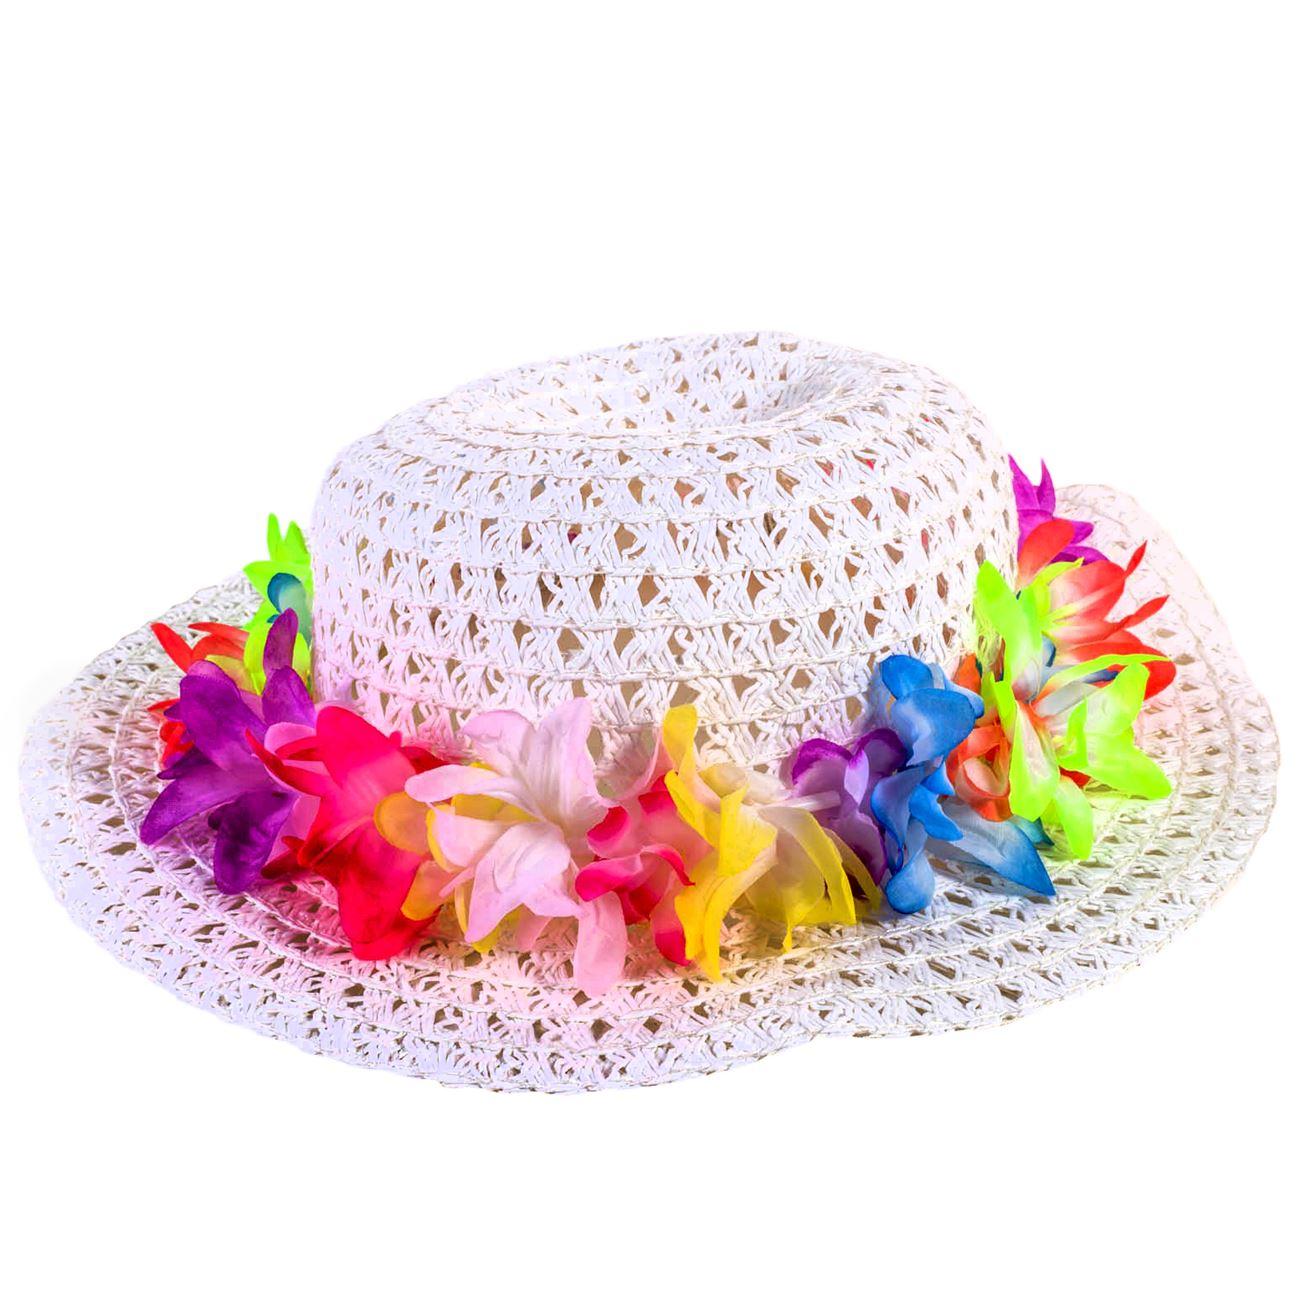 65163c8a365c Καπέλο Παιδικό Λευκό Πλεκτό Πολύχρωμα Λουλούδια   Καπέλα Κοριτσιών  Καλοκαιρινά Ψάθινα